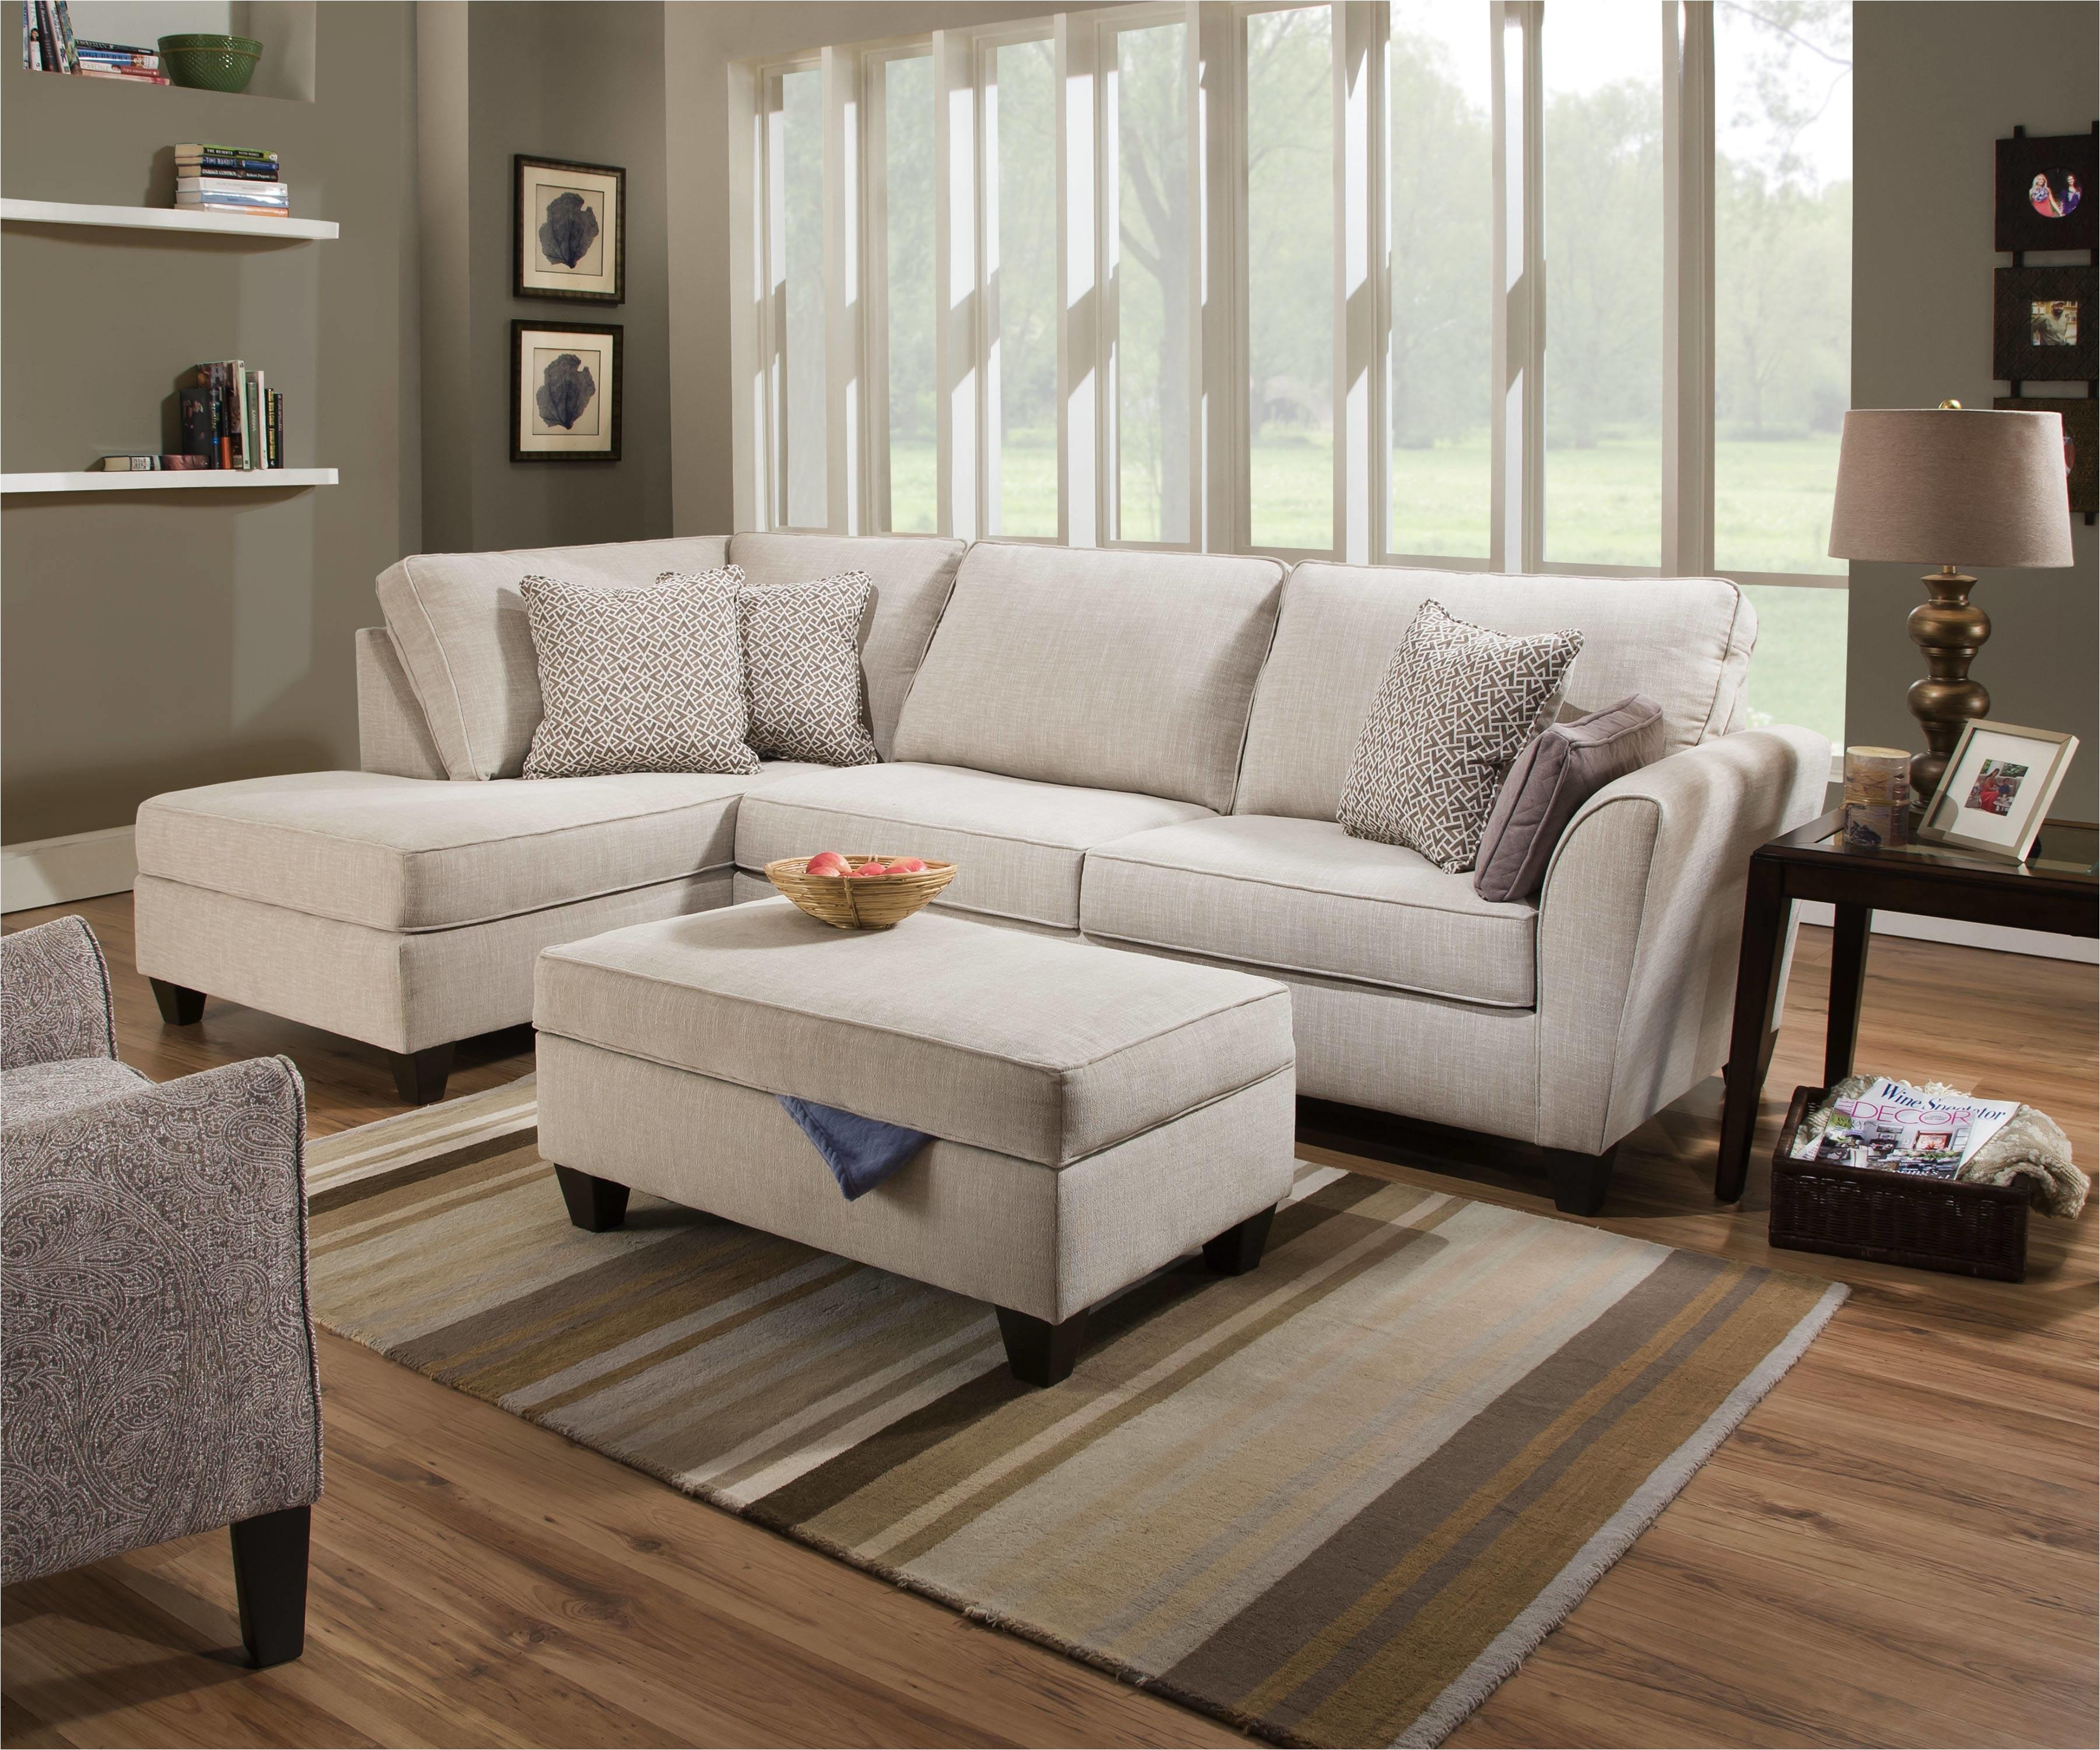 ottoman furniture elegance united furniture winston salem nc